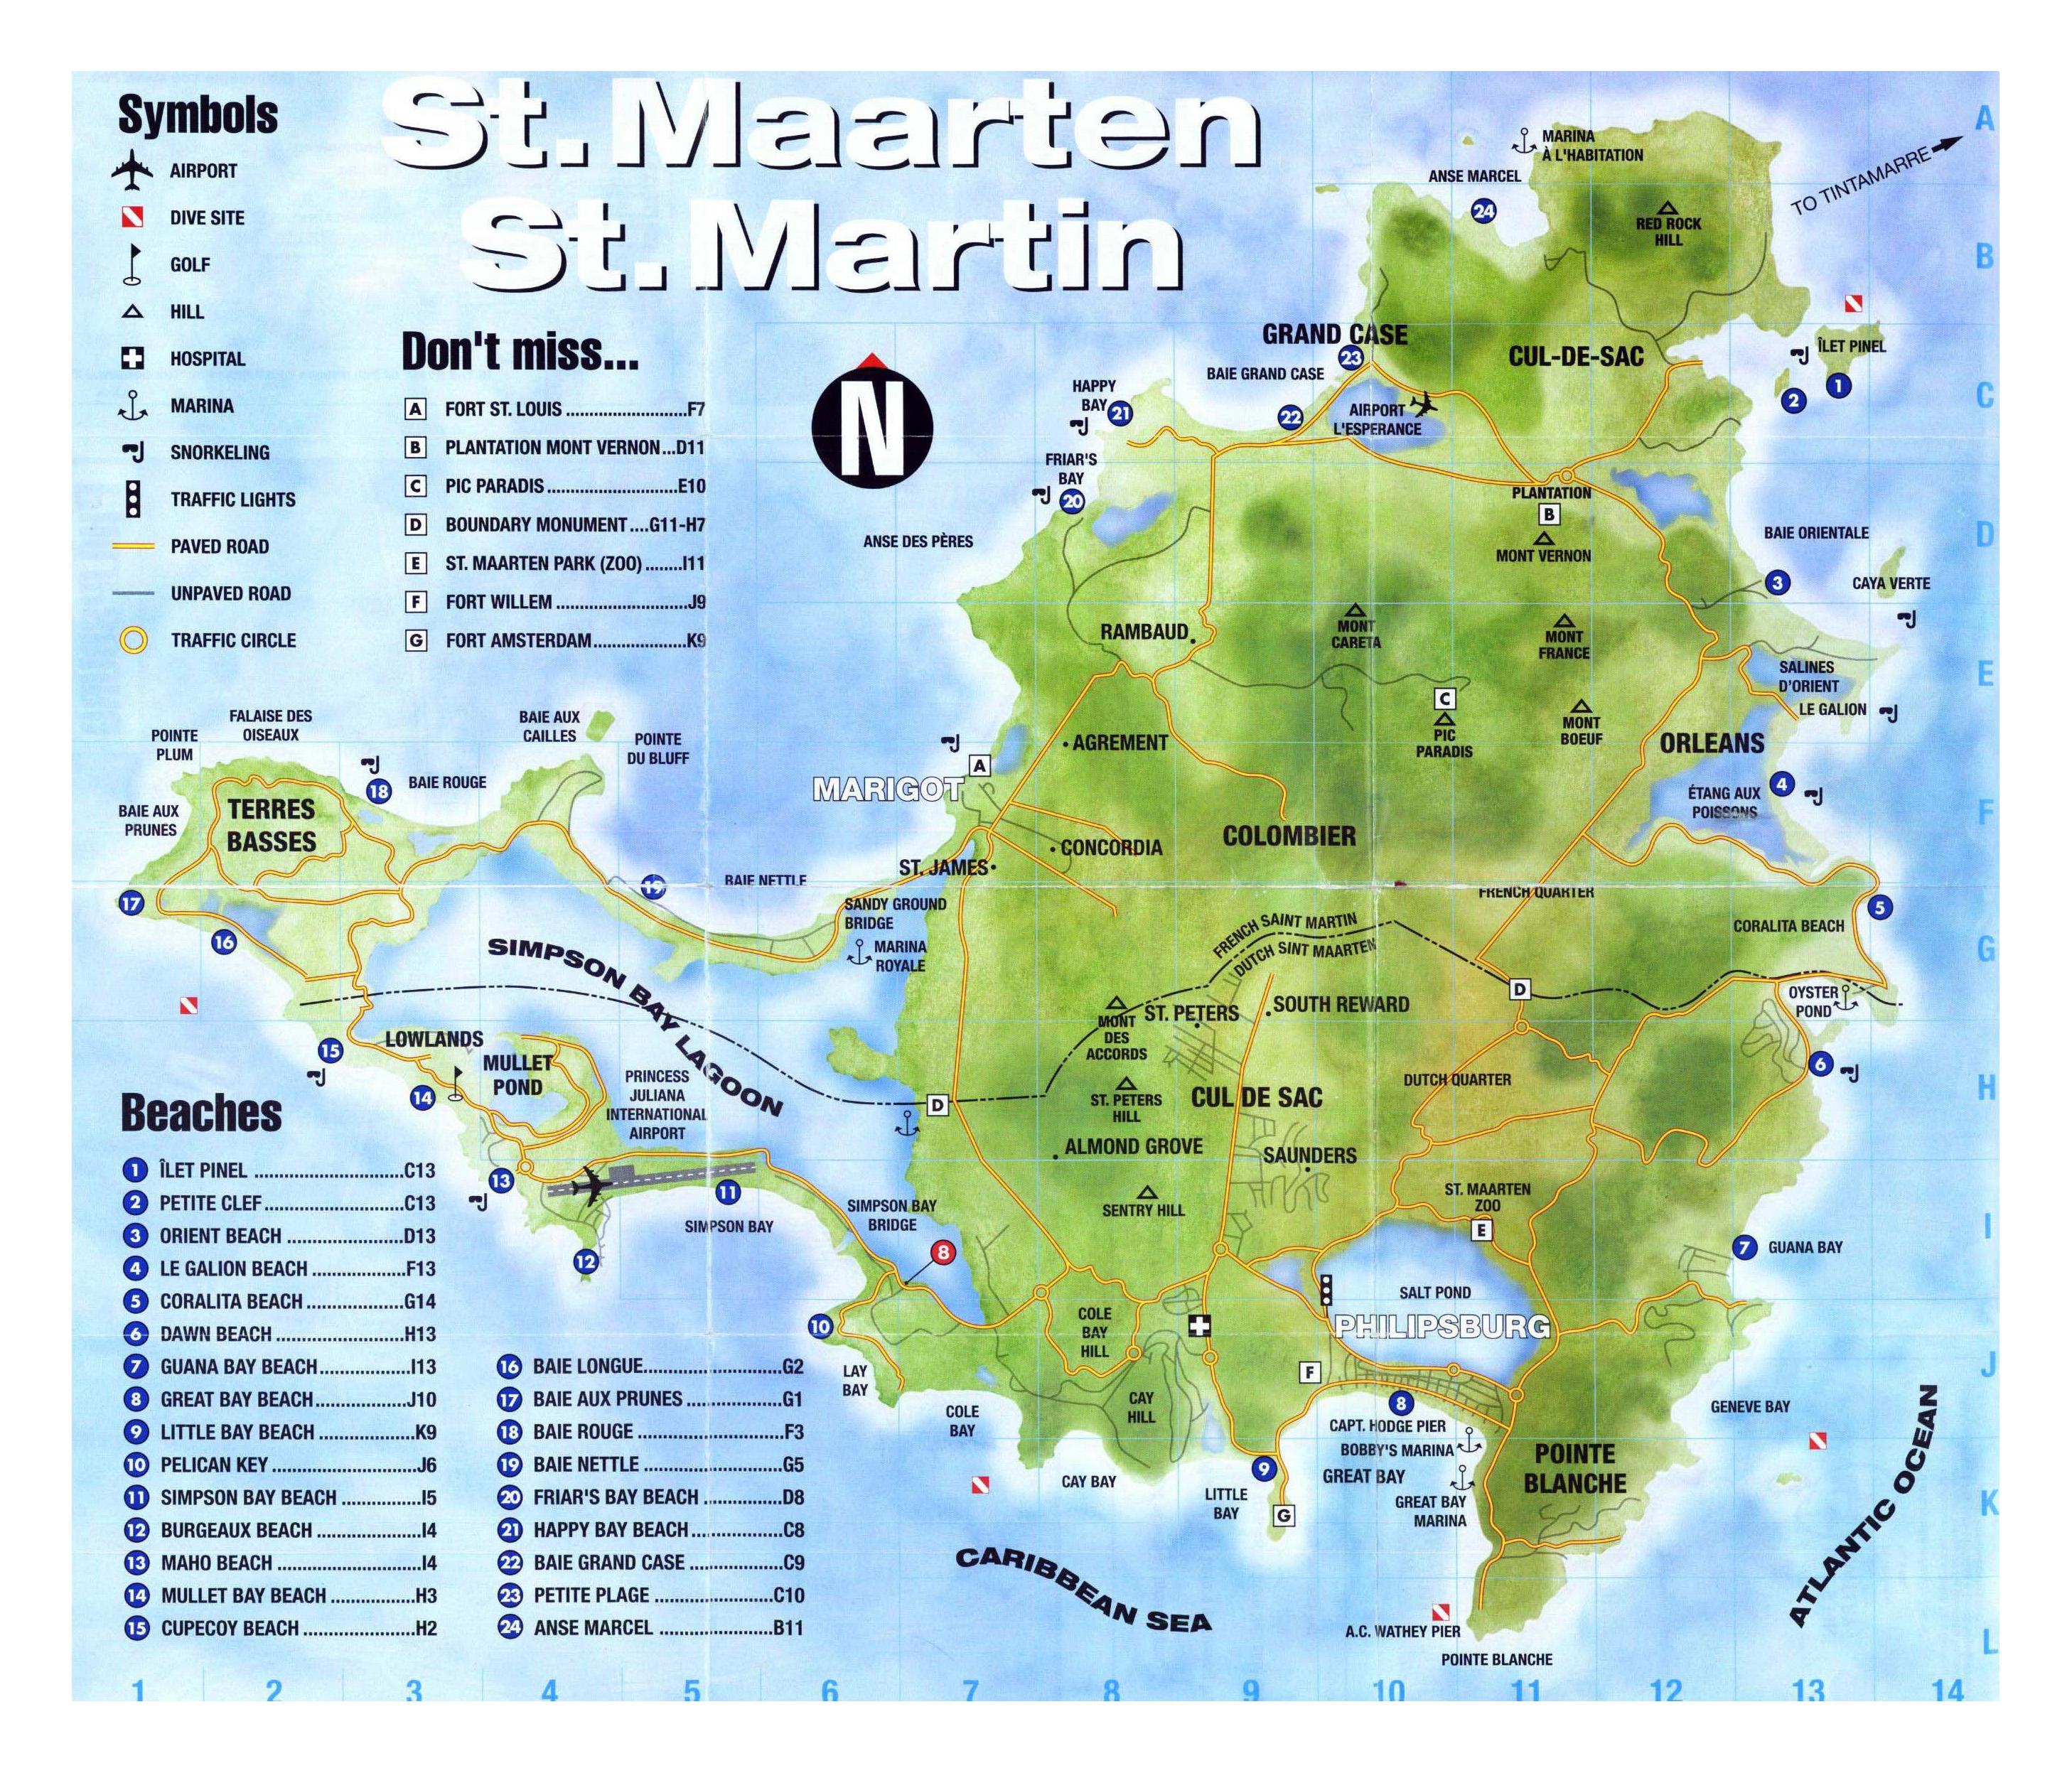 Large detailed tourist map of Sint Maarten, Saint Martin ... on aruba map, st. maarten road map, anguilla map, portugal map, guana bay map, bahamas map, st. maarten cruise port map, barbados map, satawal island map, virgin islands map, st. maarten resort map, simpson bay map, caribbean map, st maarten water taxi map, charlotte amalie map, cayman islands map, saint eustatius map, bvi map, canada map, saint lucia location map,